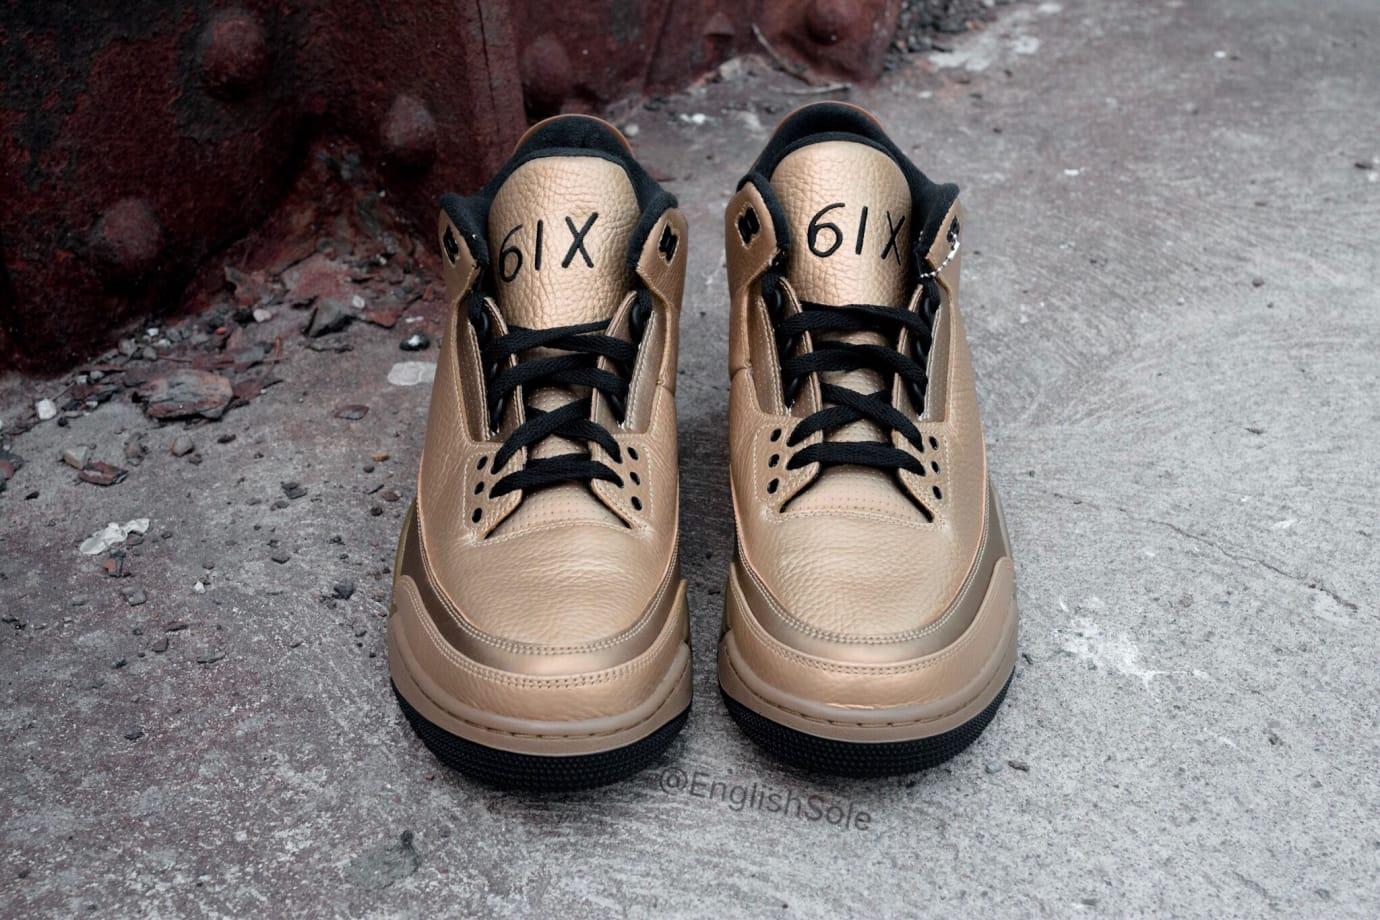 578150d157c20e Drake s OVO x Air Jordan 3  6ix  Detailed Images